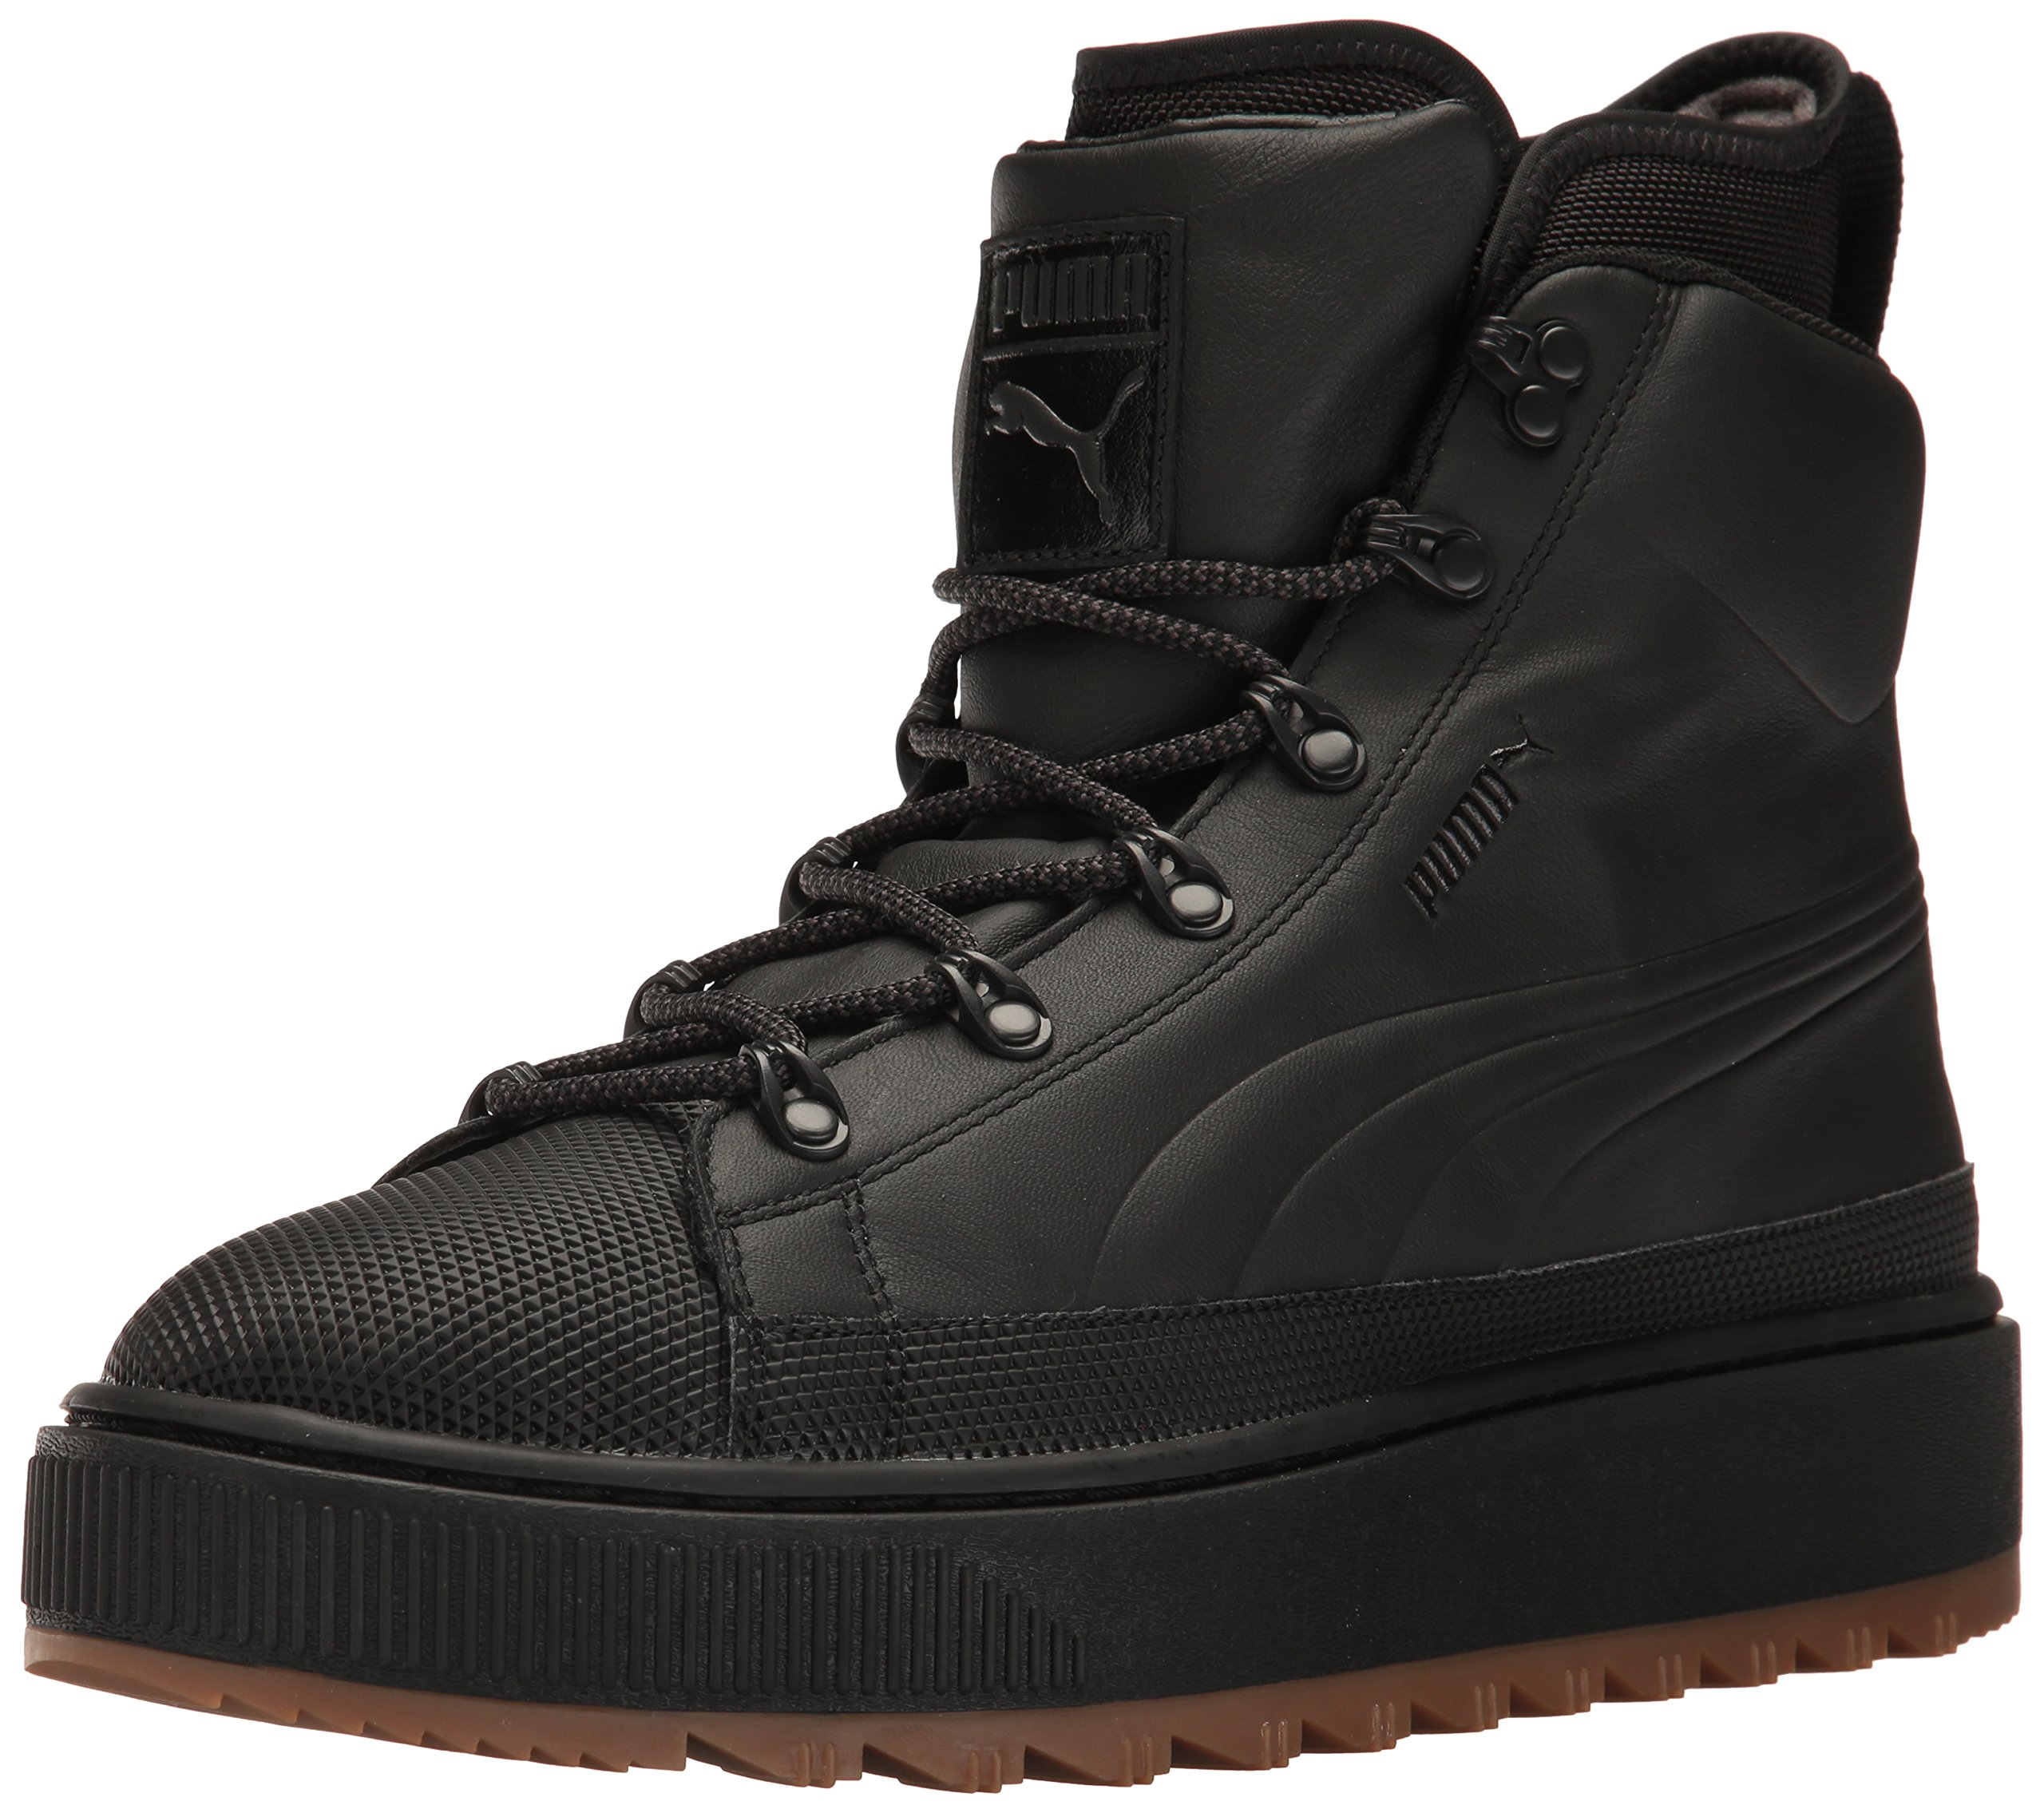 PUMA Men's The Ren Boot Walking Shoe, Black, 8.5 M US